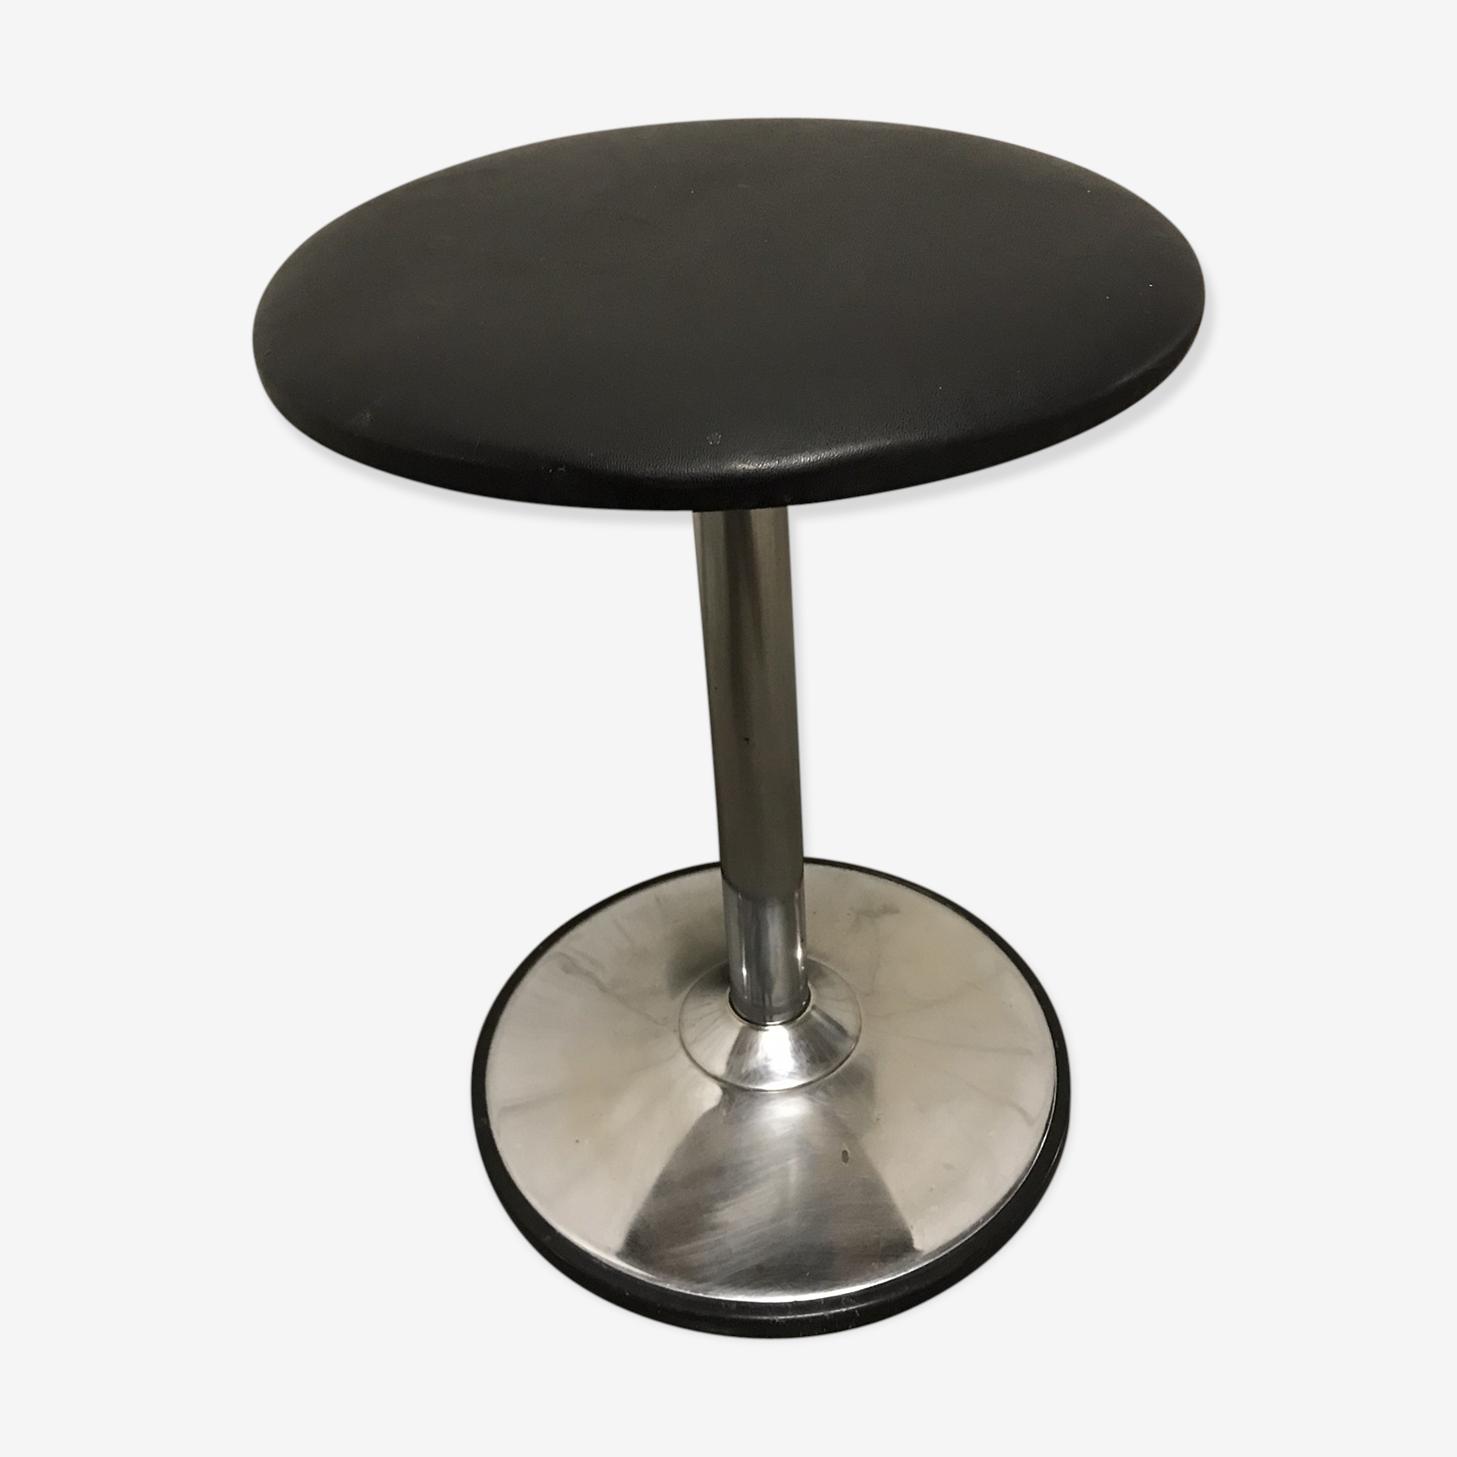 Telescopic stool by Mirima, 1950s